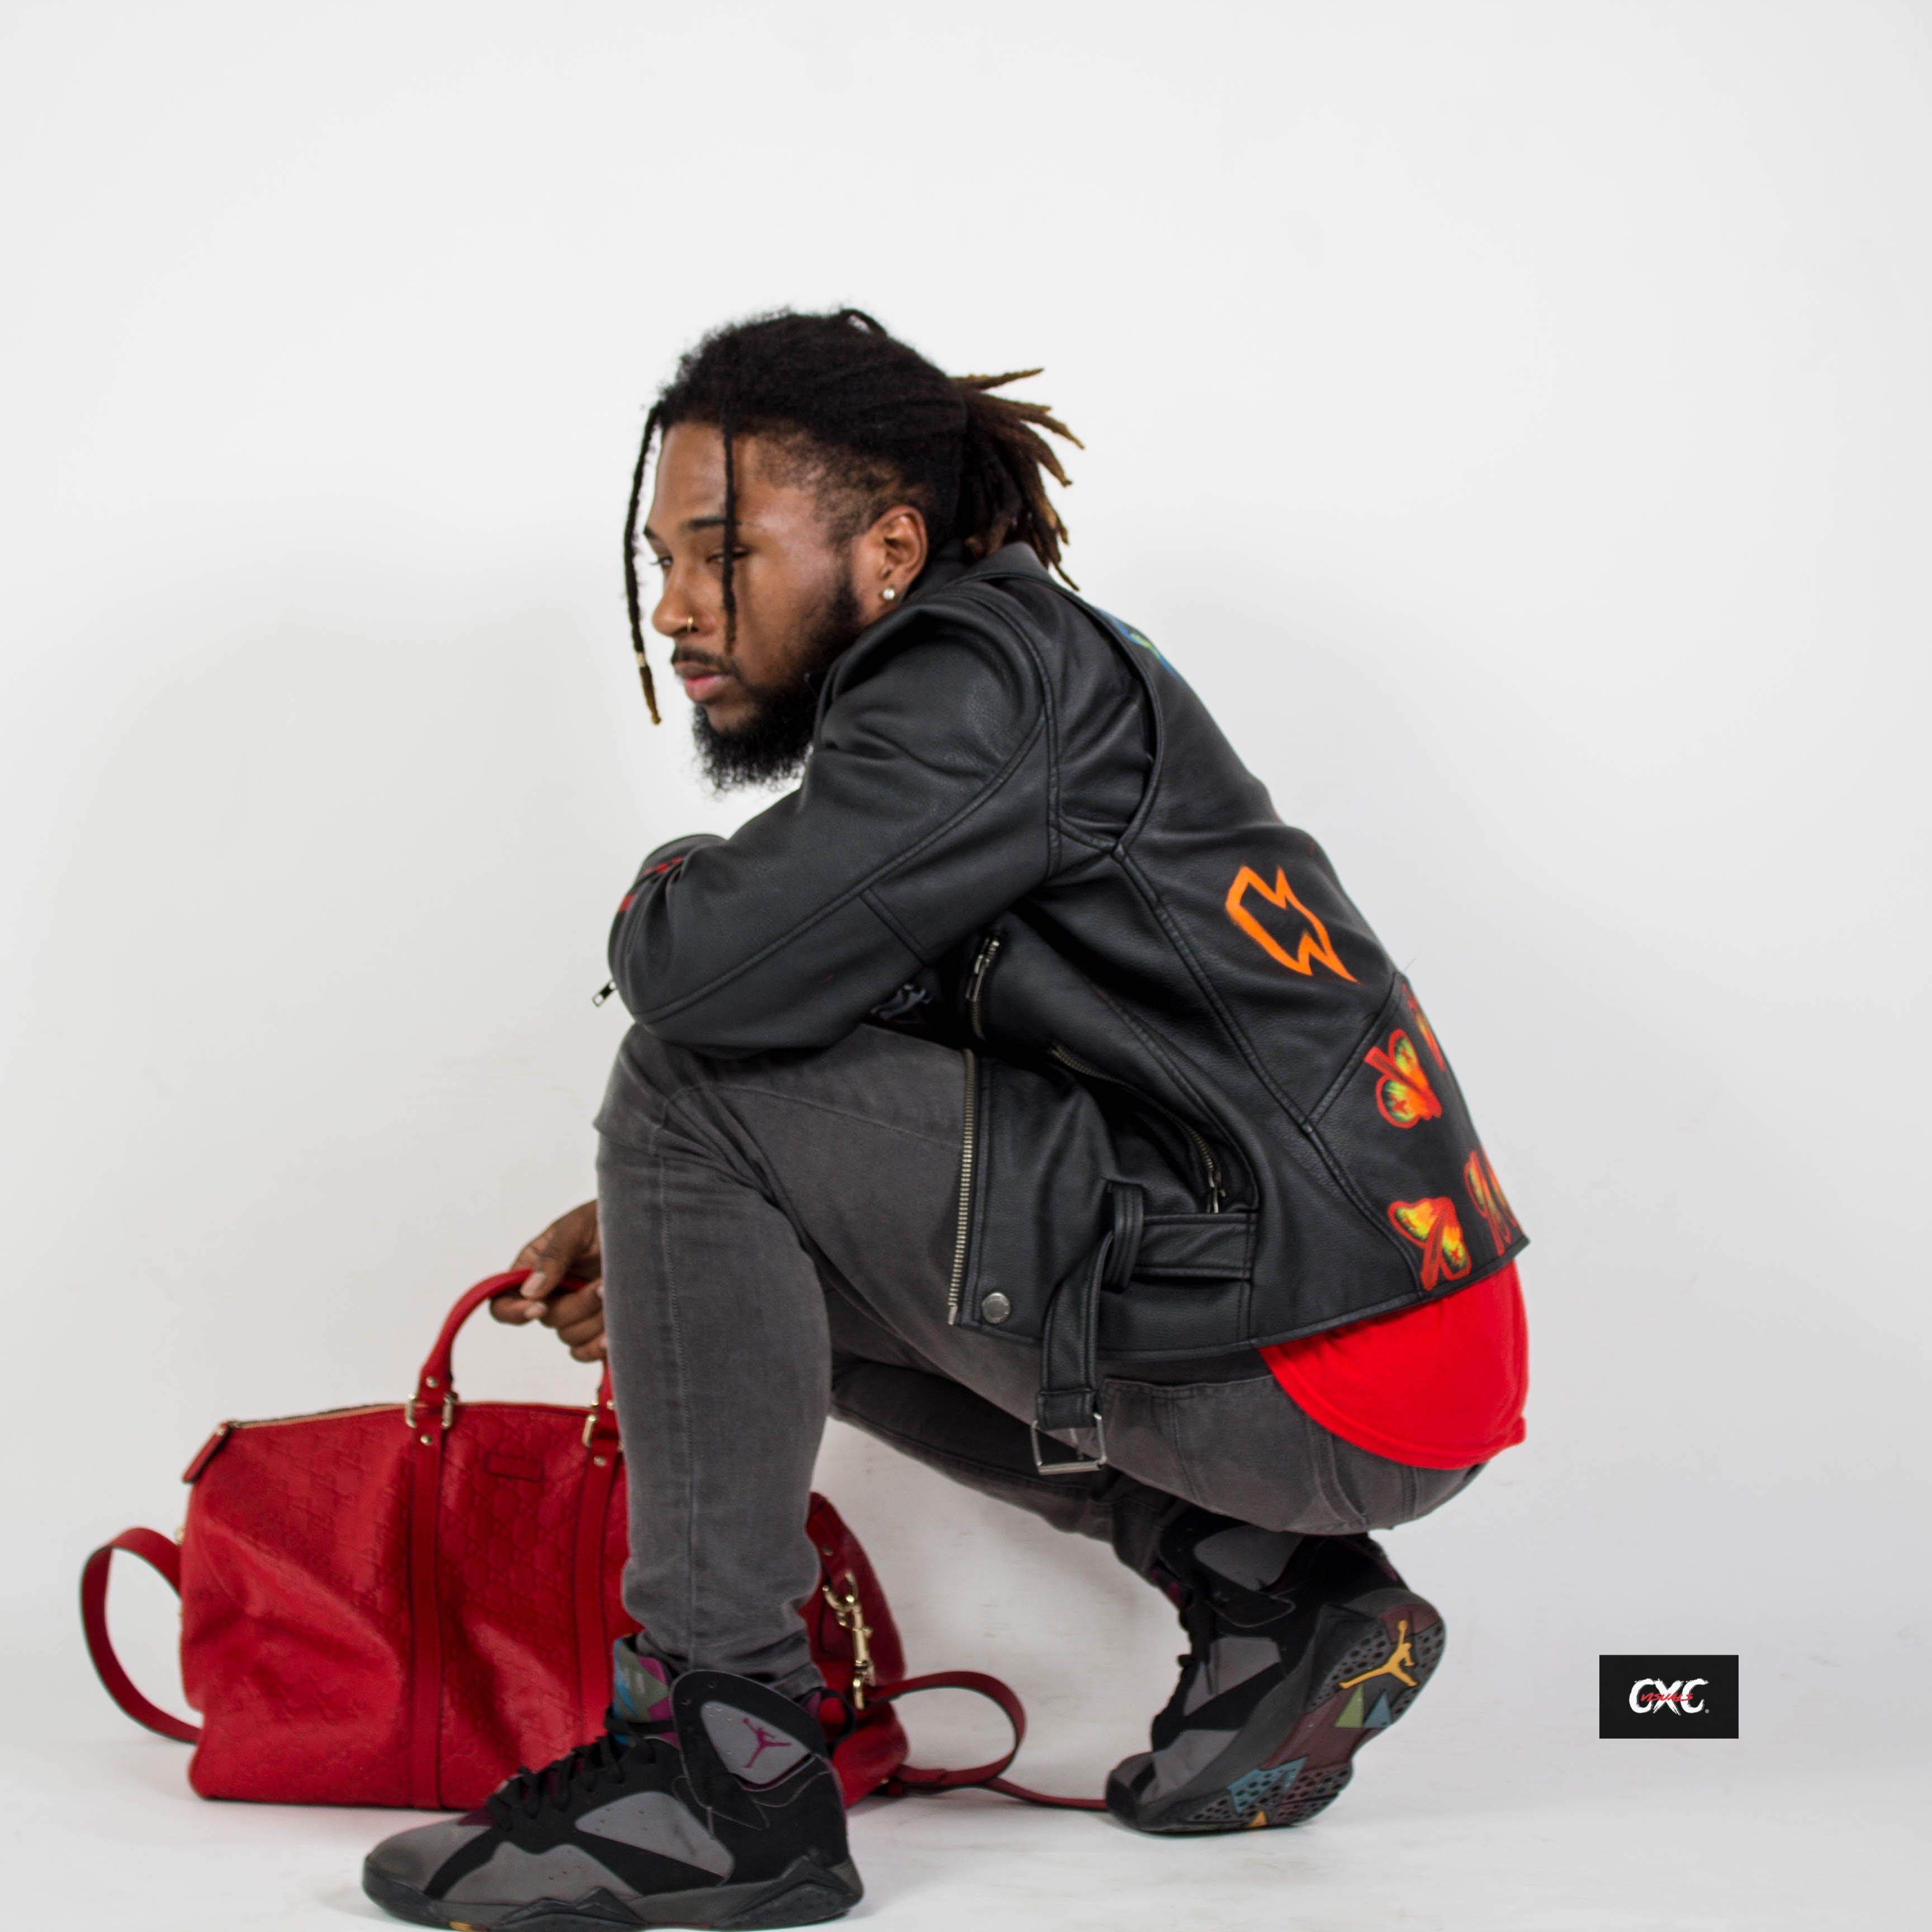 Free stock photo of #mobilechallenge, #models, #outdoorchallenge, black boy